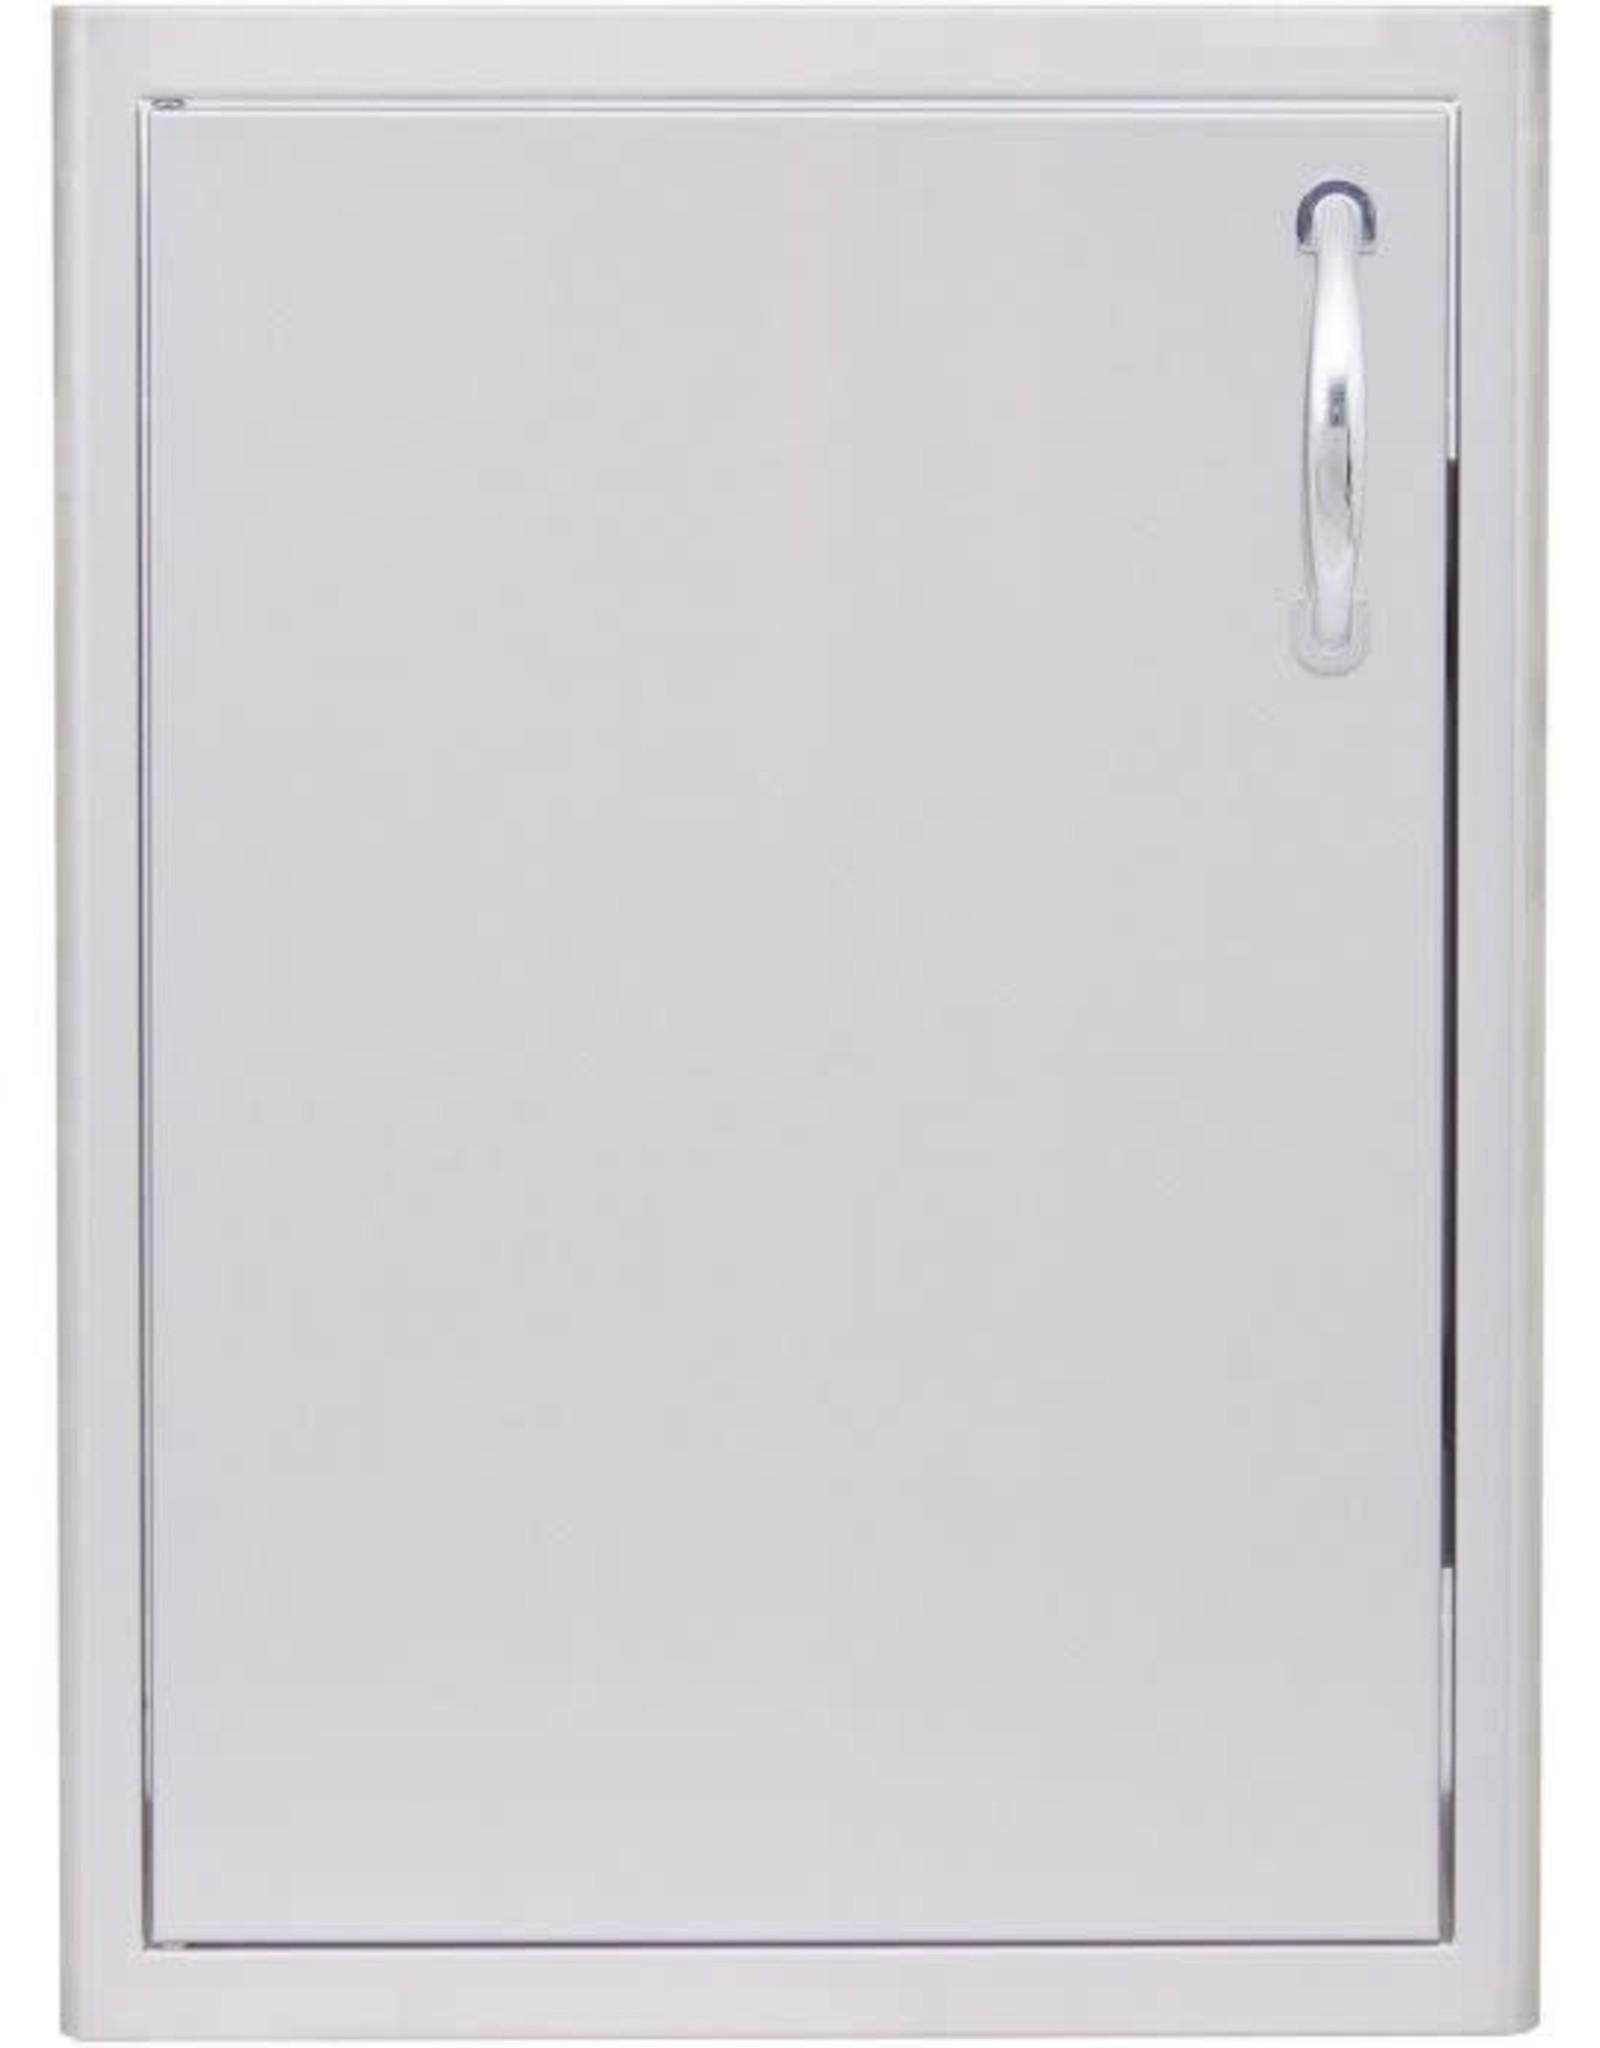 Blaze Outdoor Products Blaze 18-Inch Left Hinged Stainless Steel Single Access Door - Vertical - BLZ-SV-1420R-LH